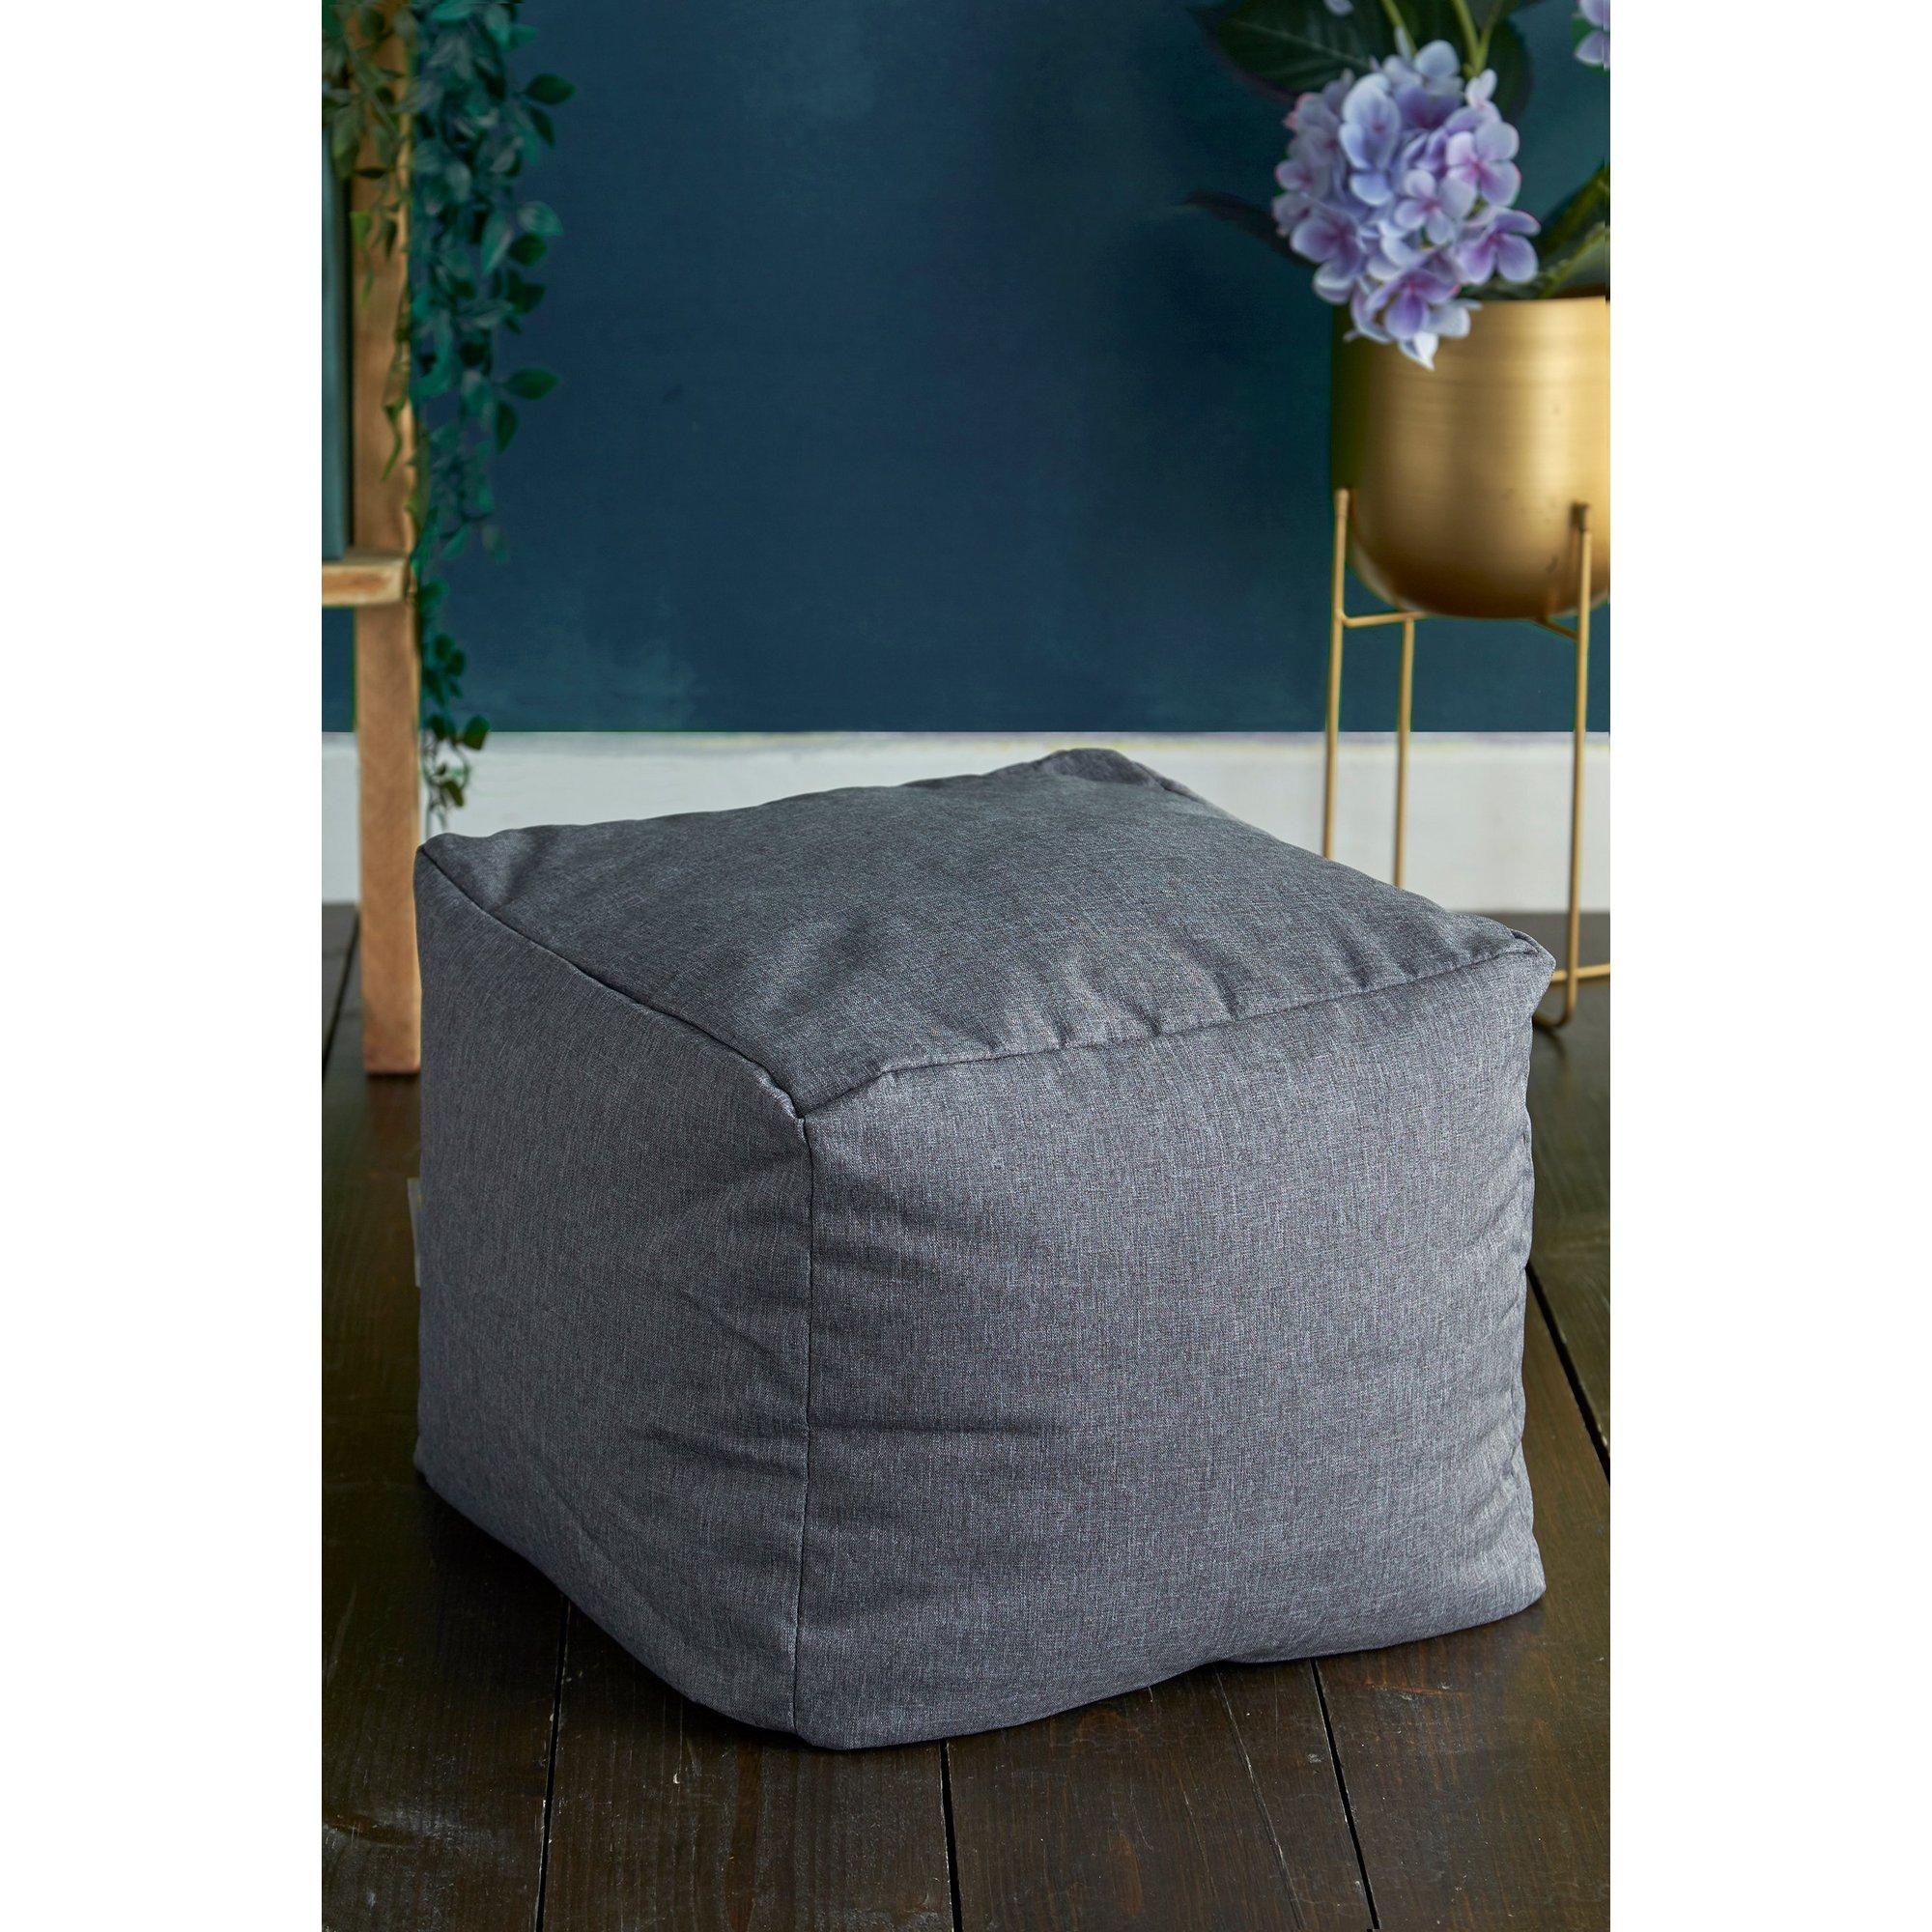 Image of Grey Square Linen Bean Bag Pouffe